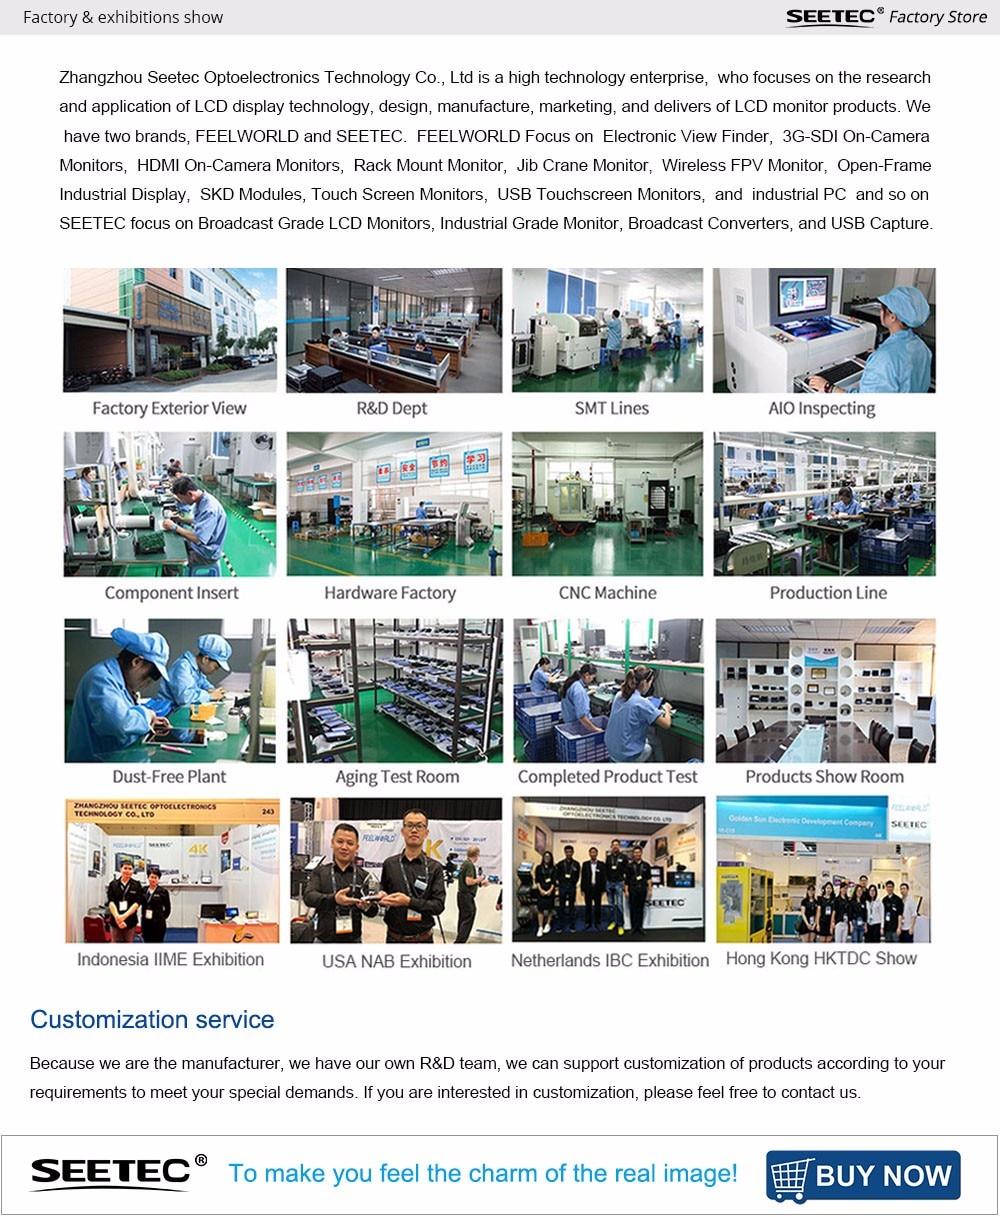 seetec factory